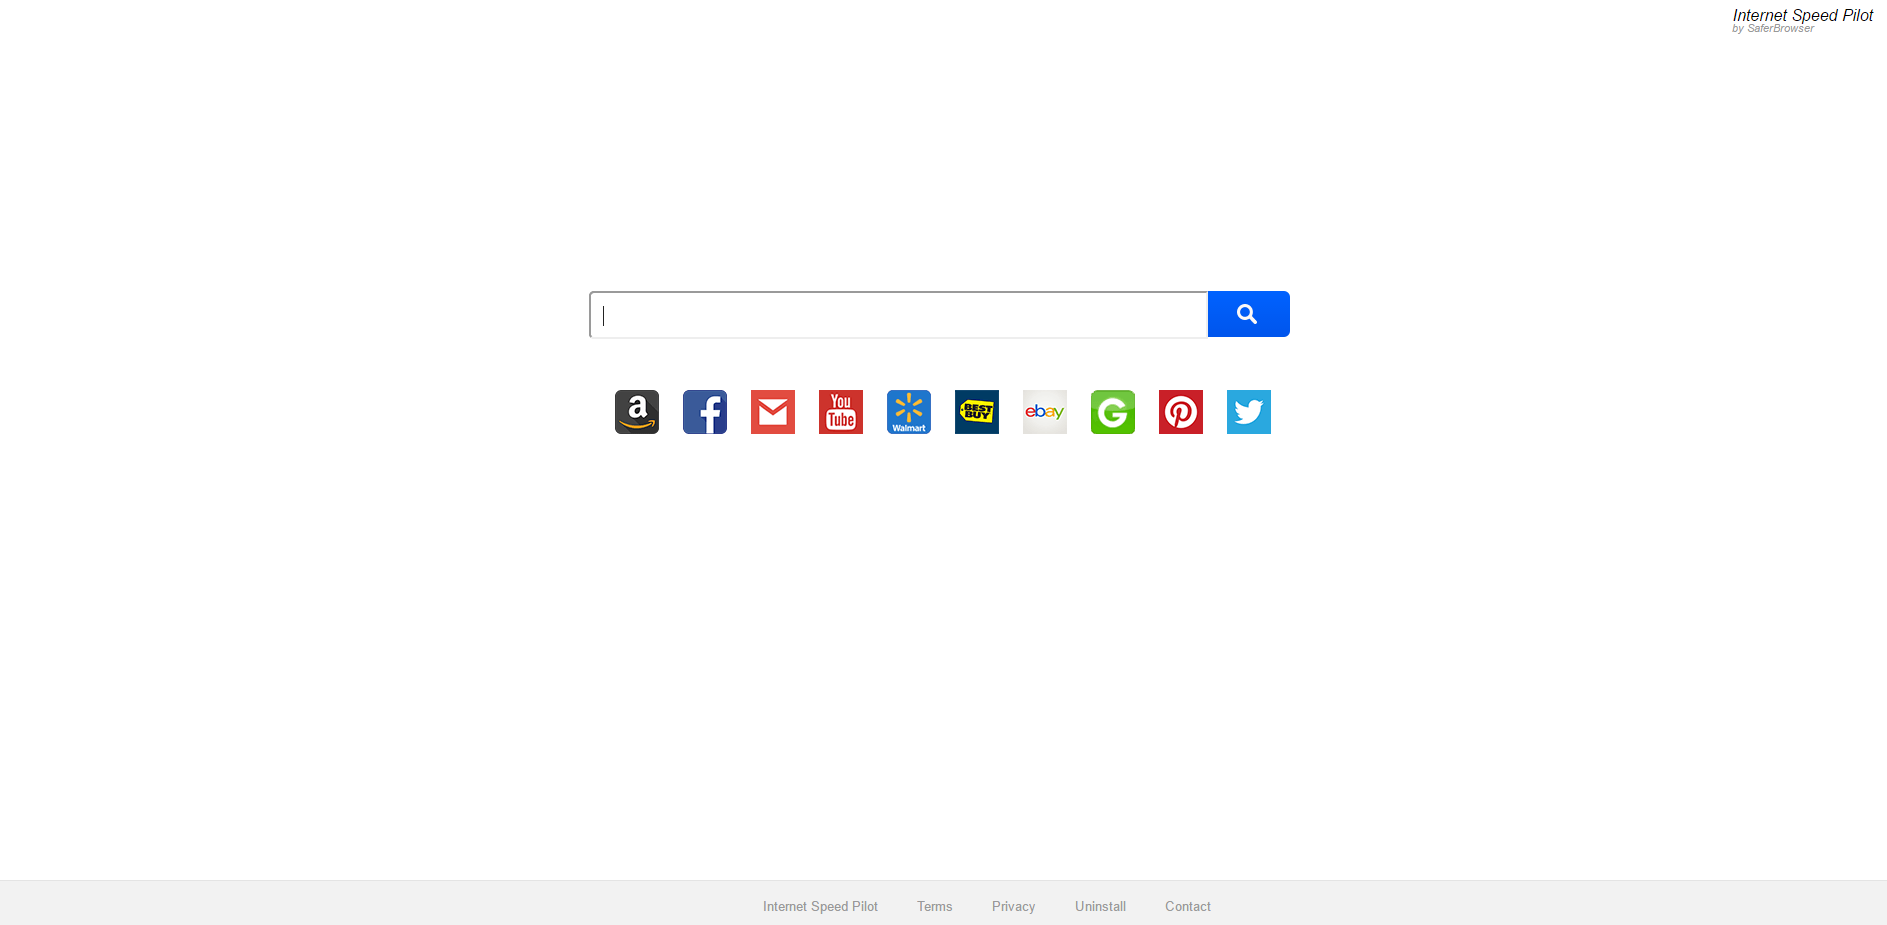 Search2.internetspeedpilot.com Ads